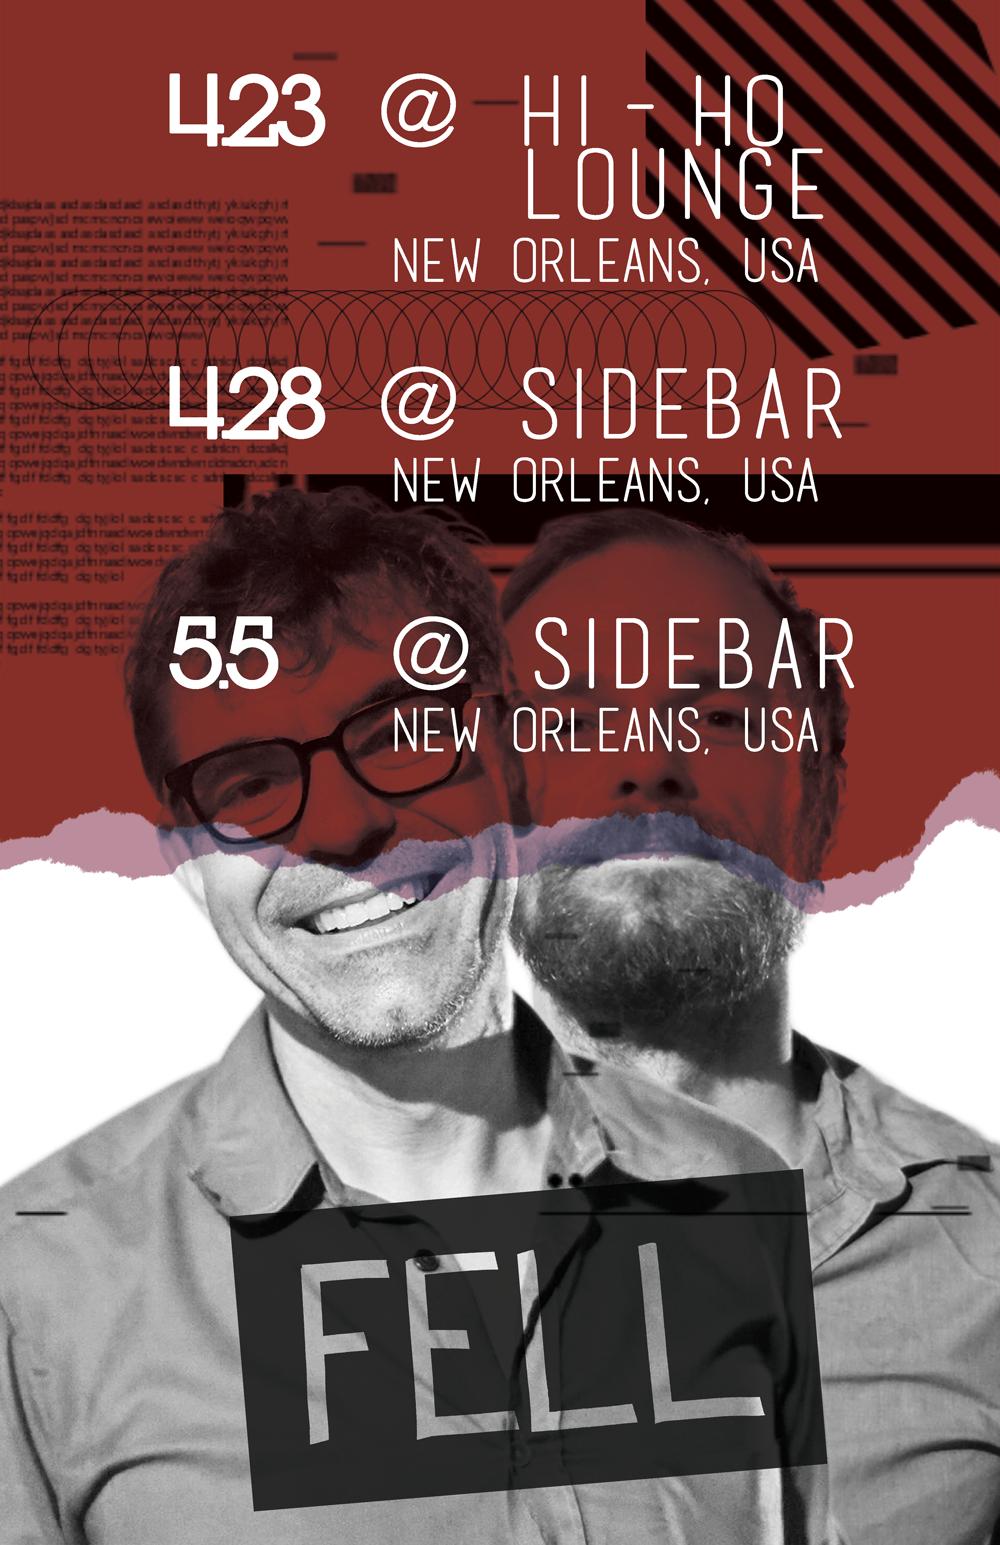 Simon-2018-Tour-11x17-Poster.png